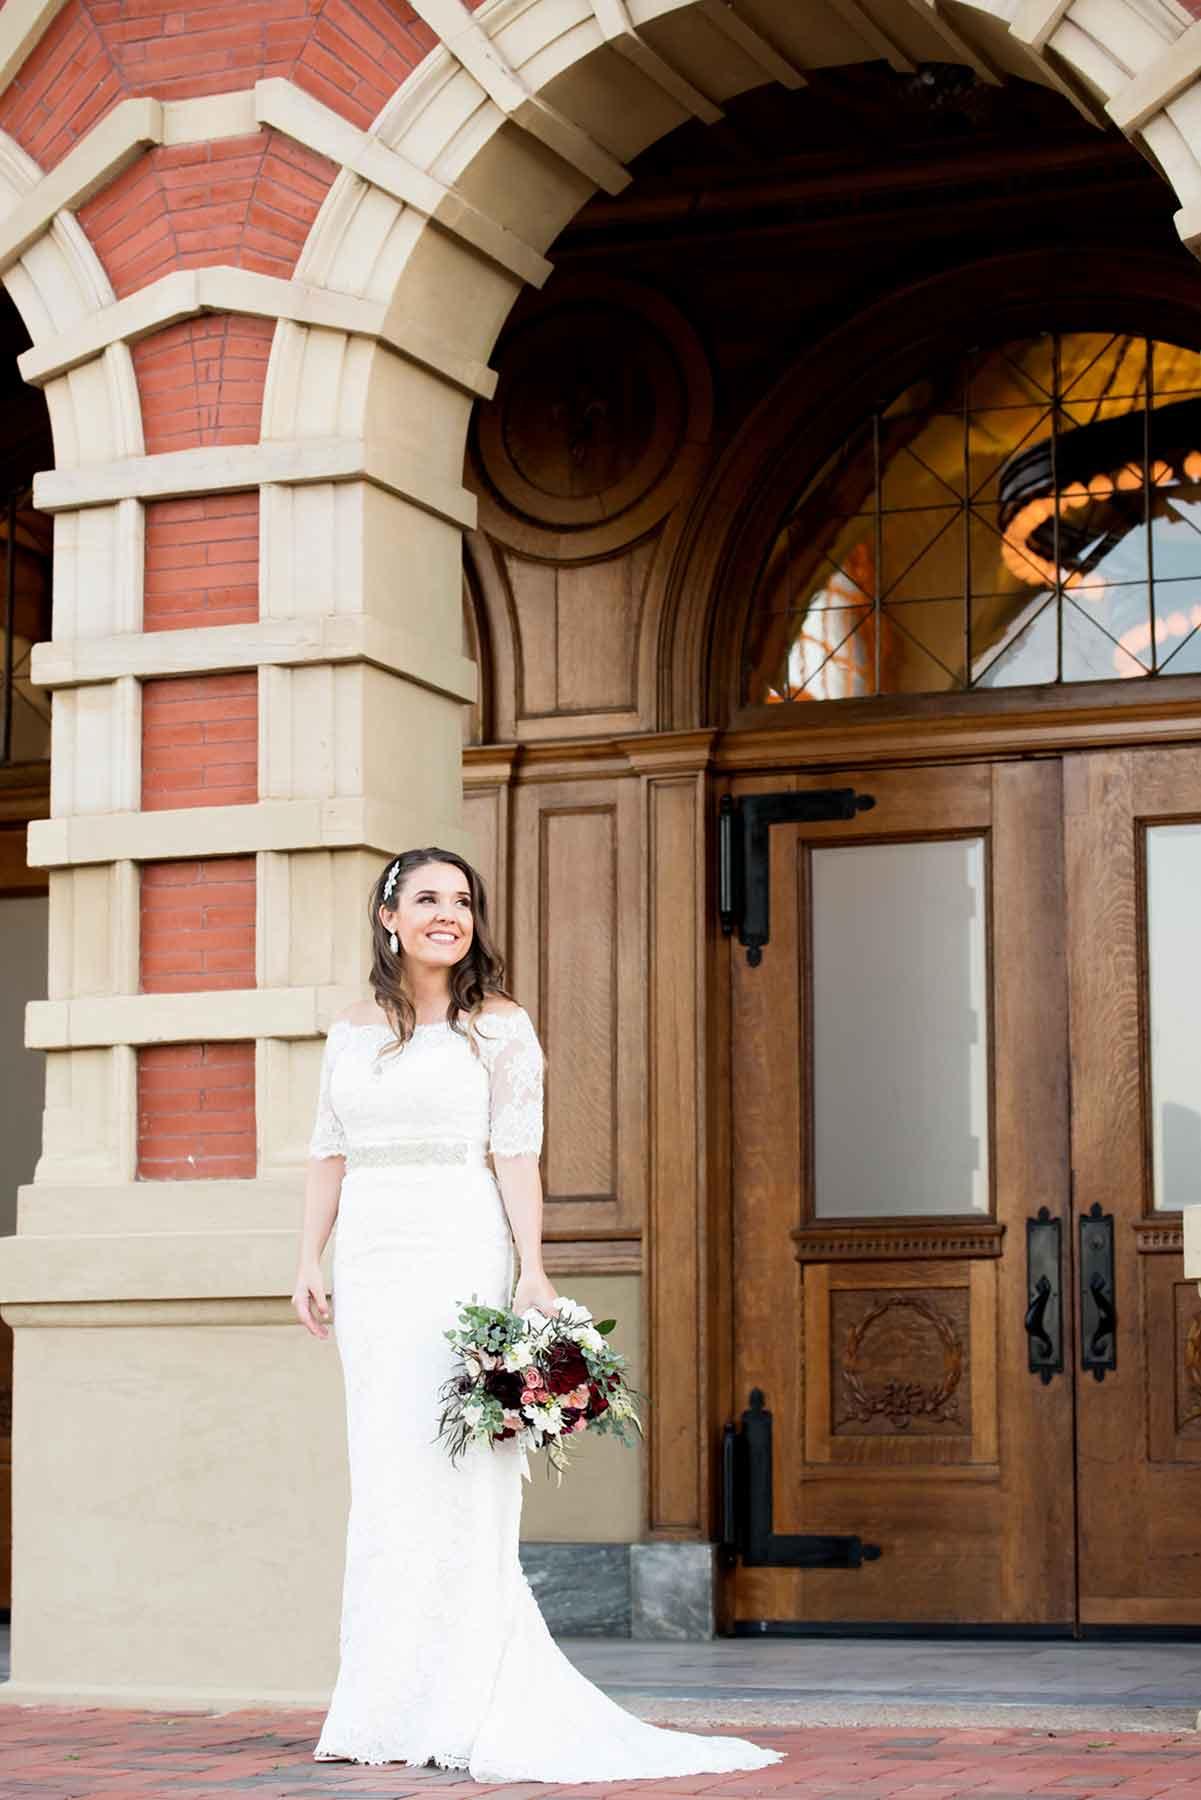 Real brides bliss bridal salon nicki wisner photography junglespirit Image collections